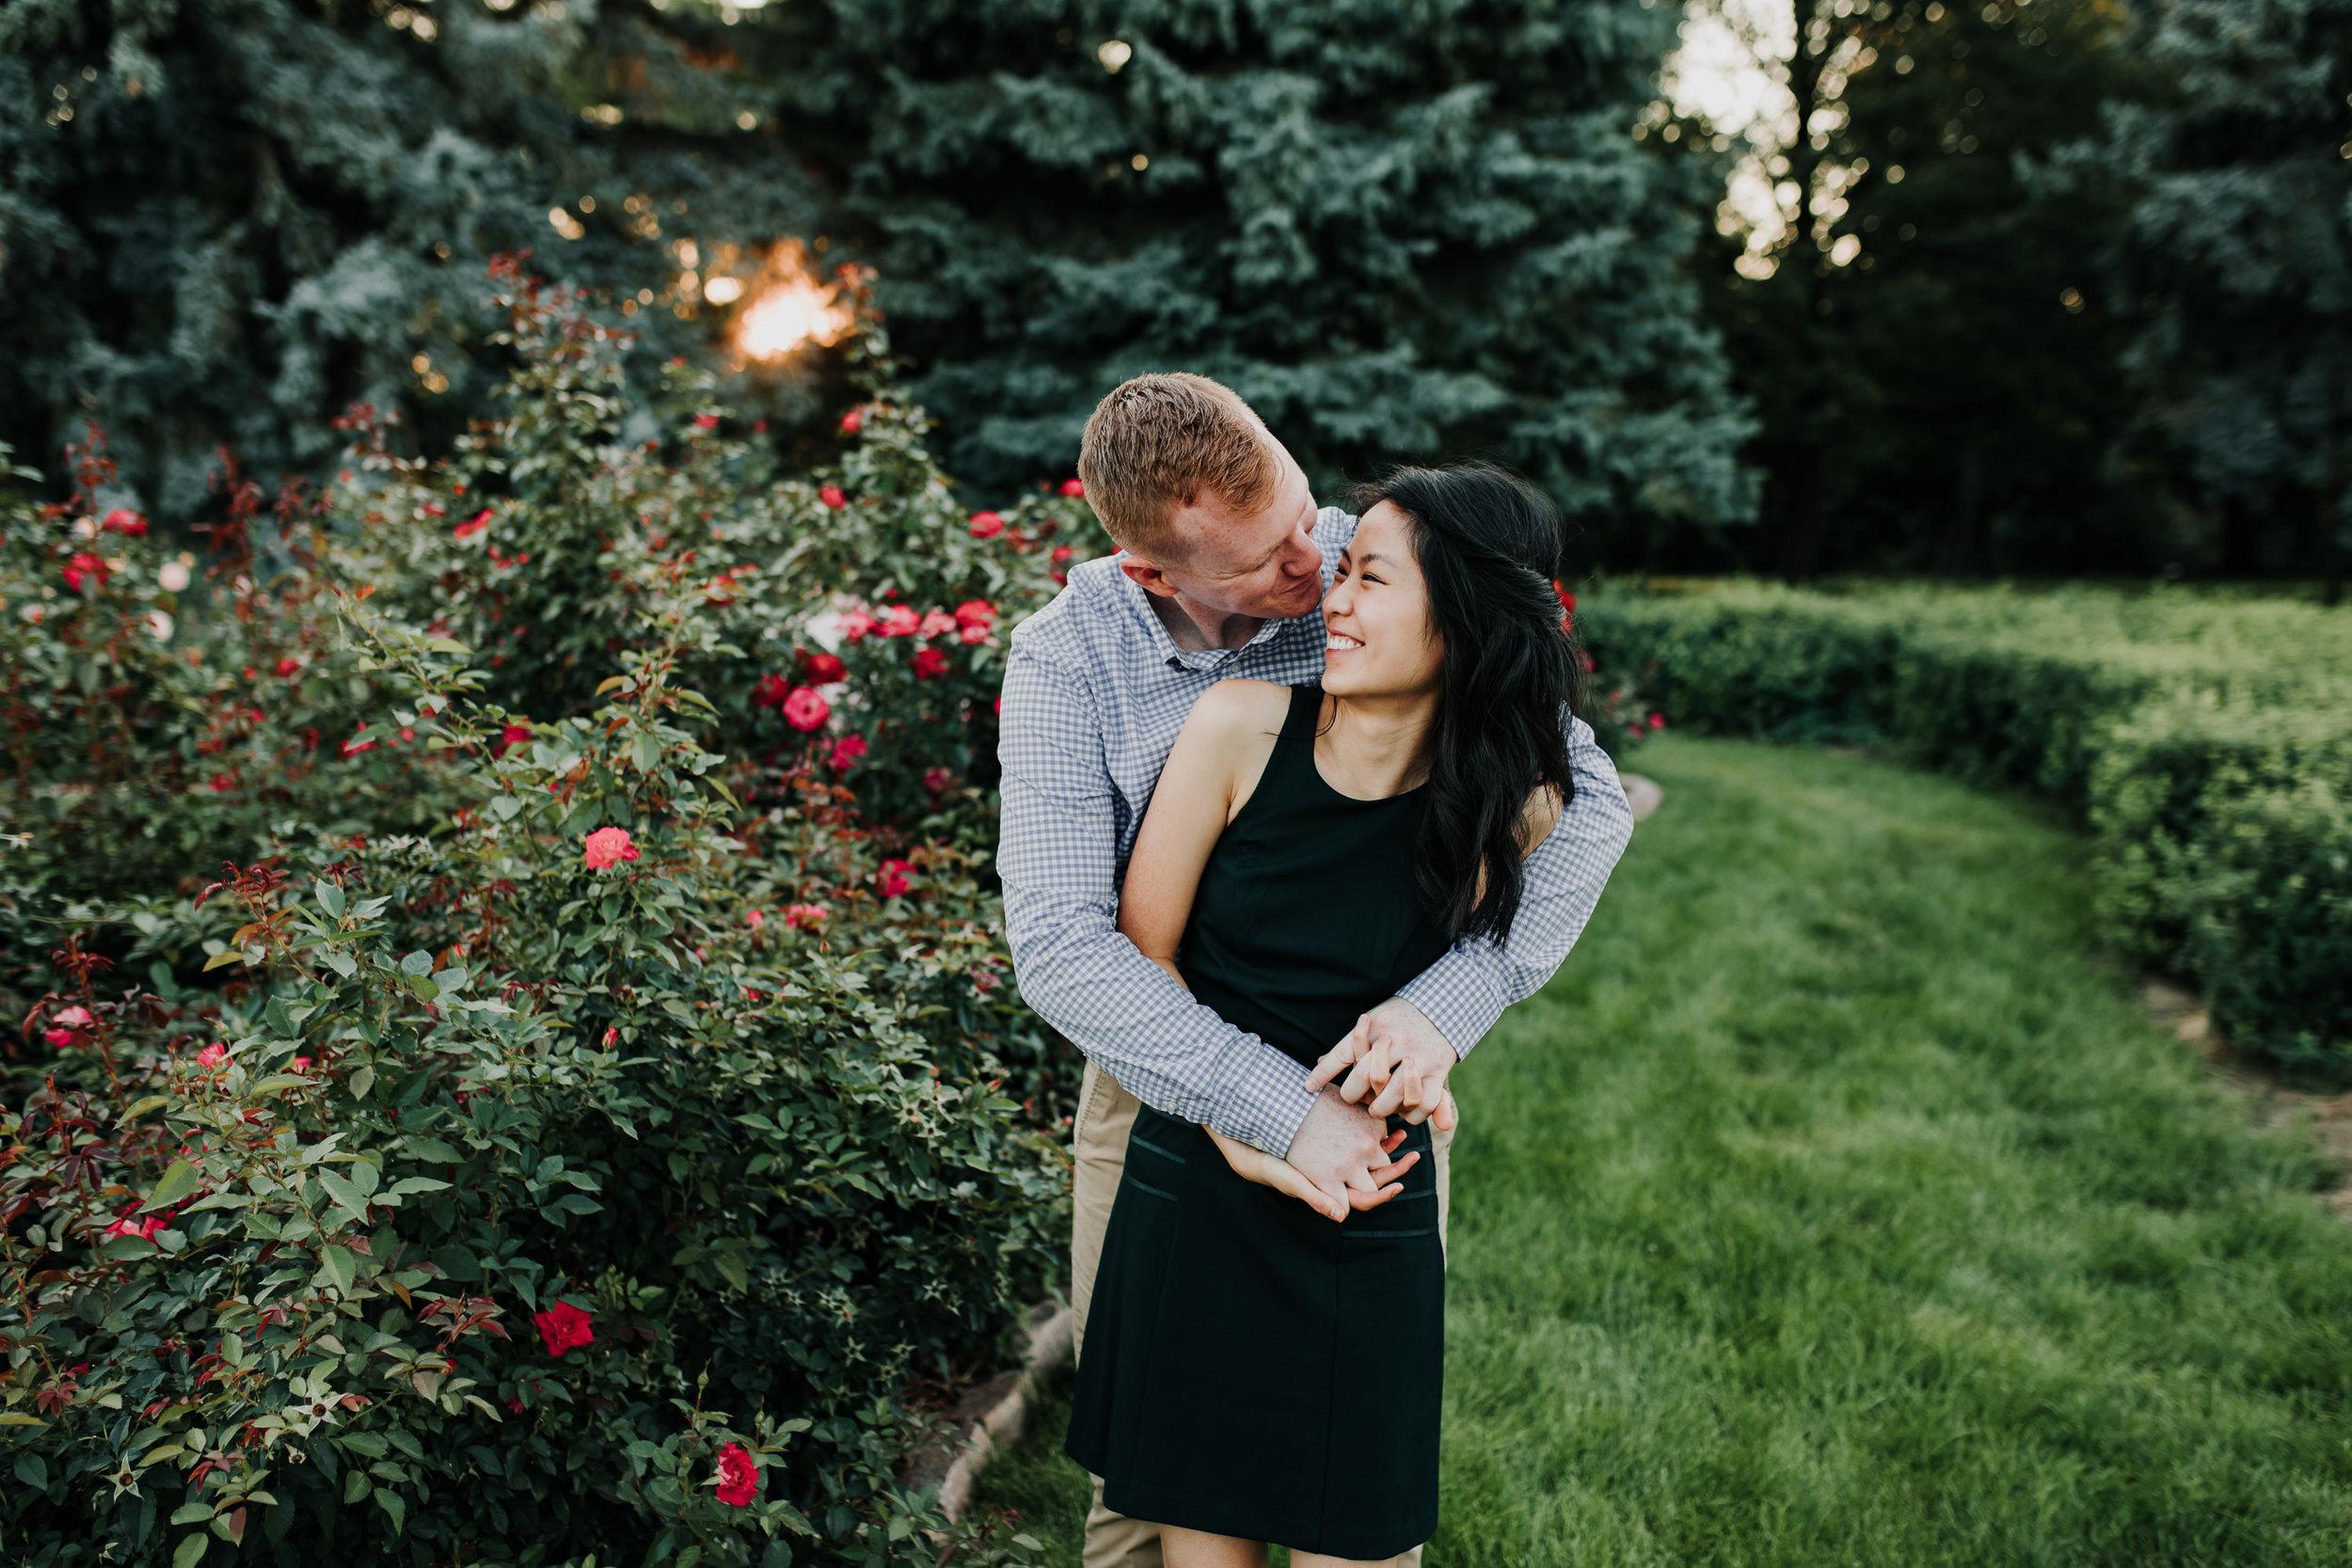 Catherin & Kyle - Married - Nathaniel Jensen Photography - Omaha Nebraska Wedding Photograper - Memorial Park - Joslyn Castle Engagement Session-60.jpg